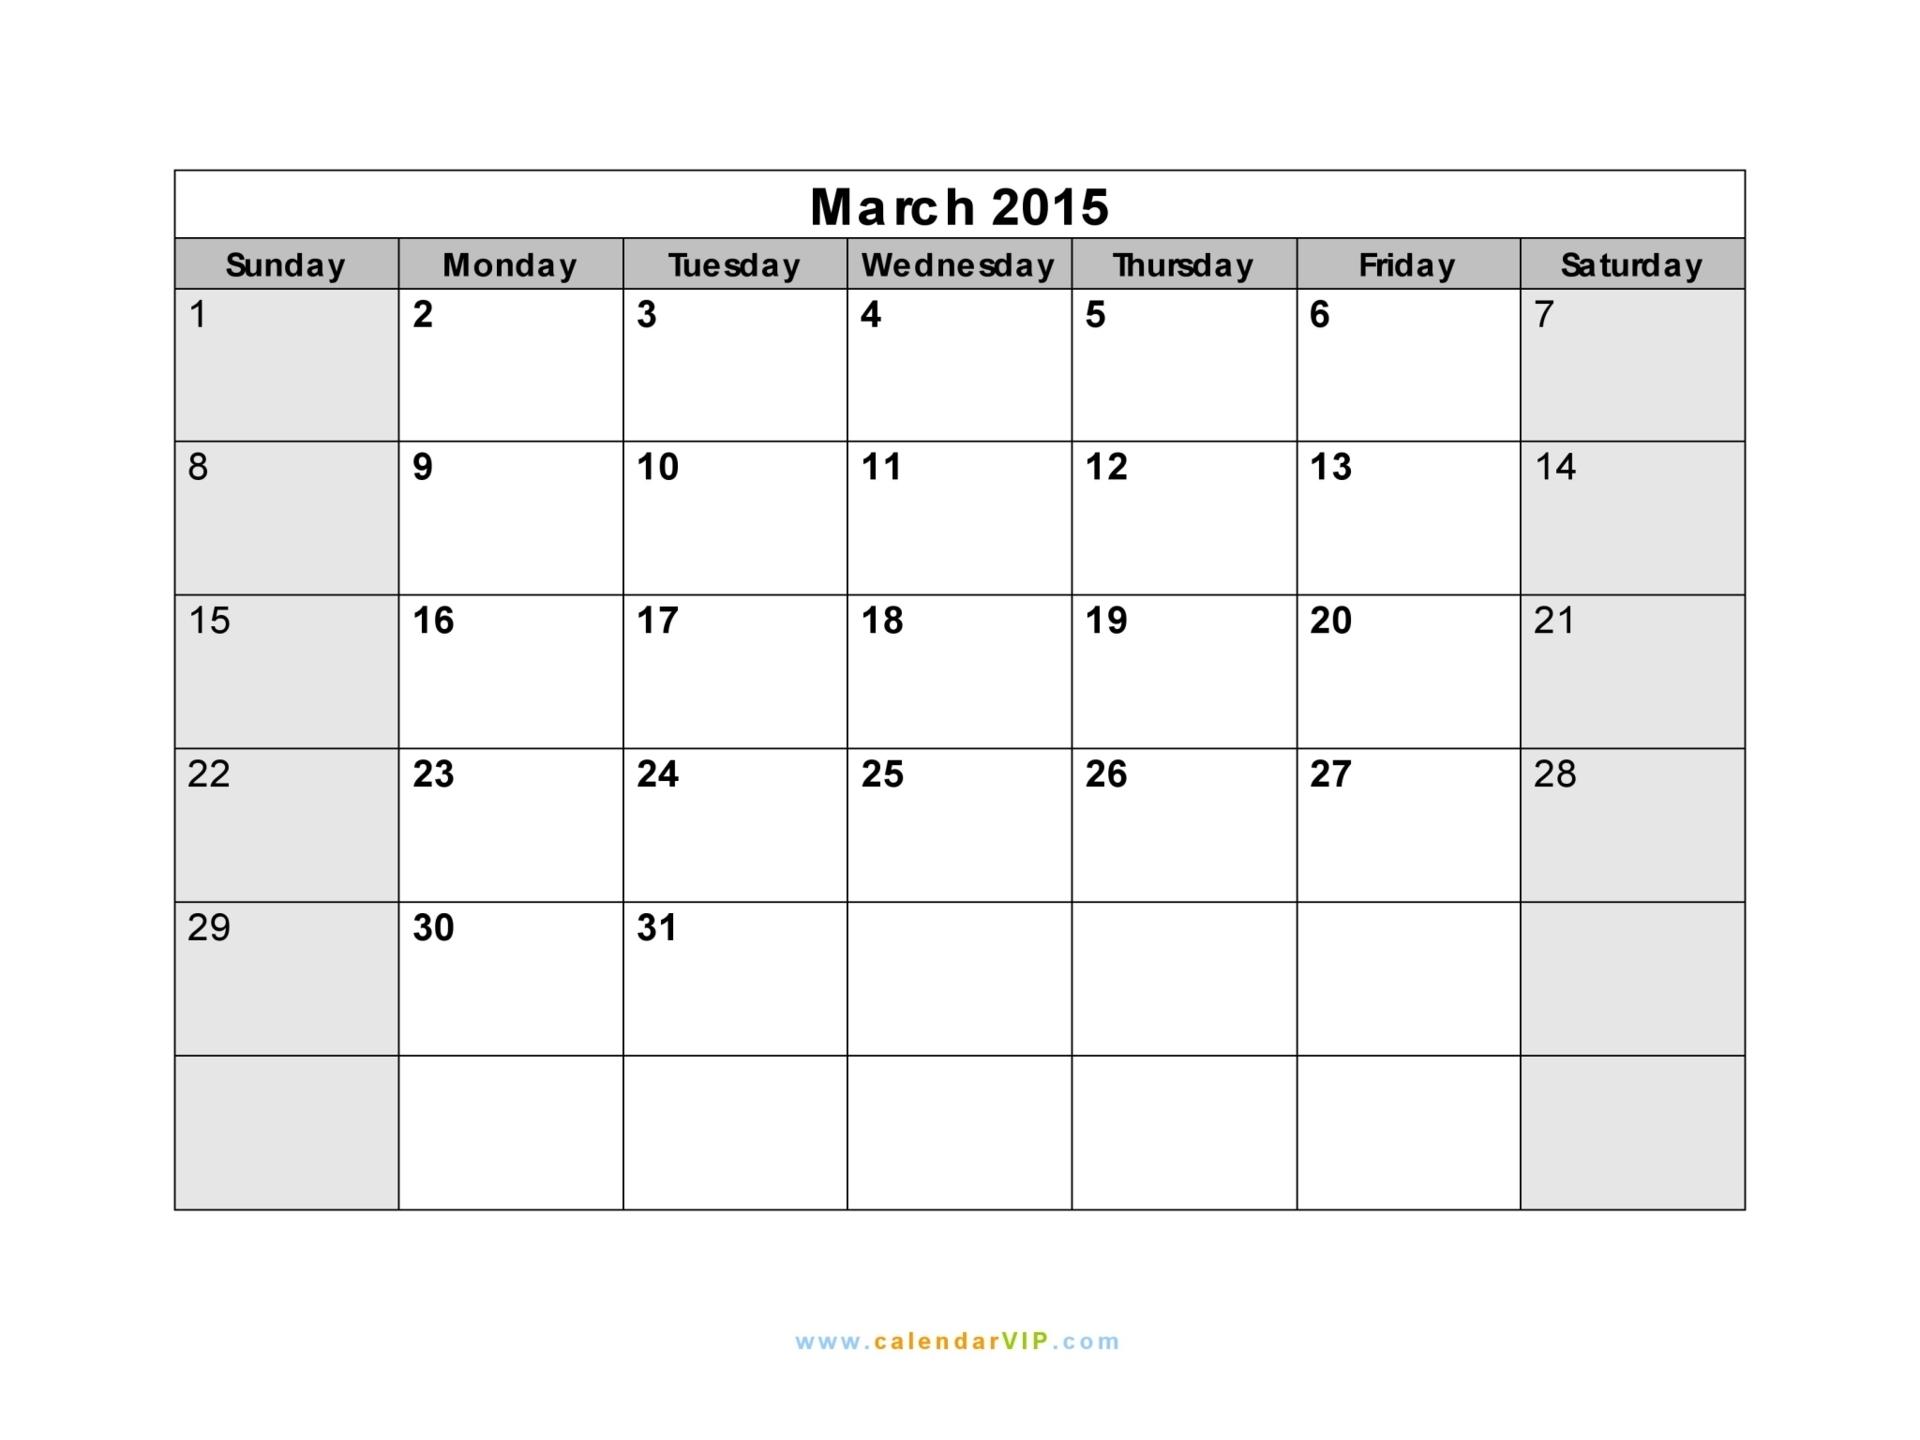 Calender Vip January 2016 Tv Calendar January 2017 Premiere And Finale Dates Tvline March 2015 Calendar Printable